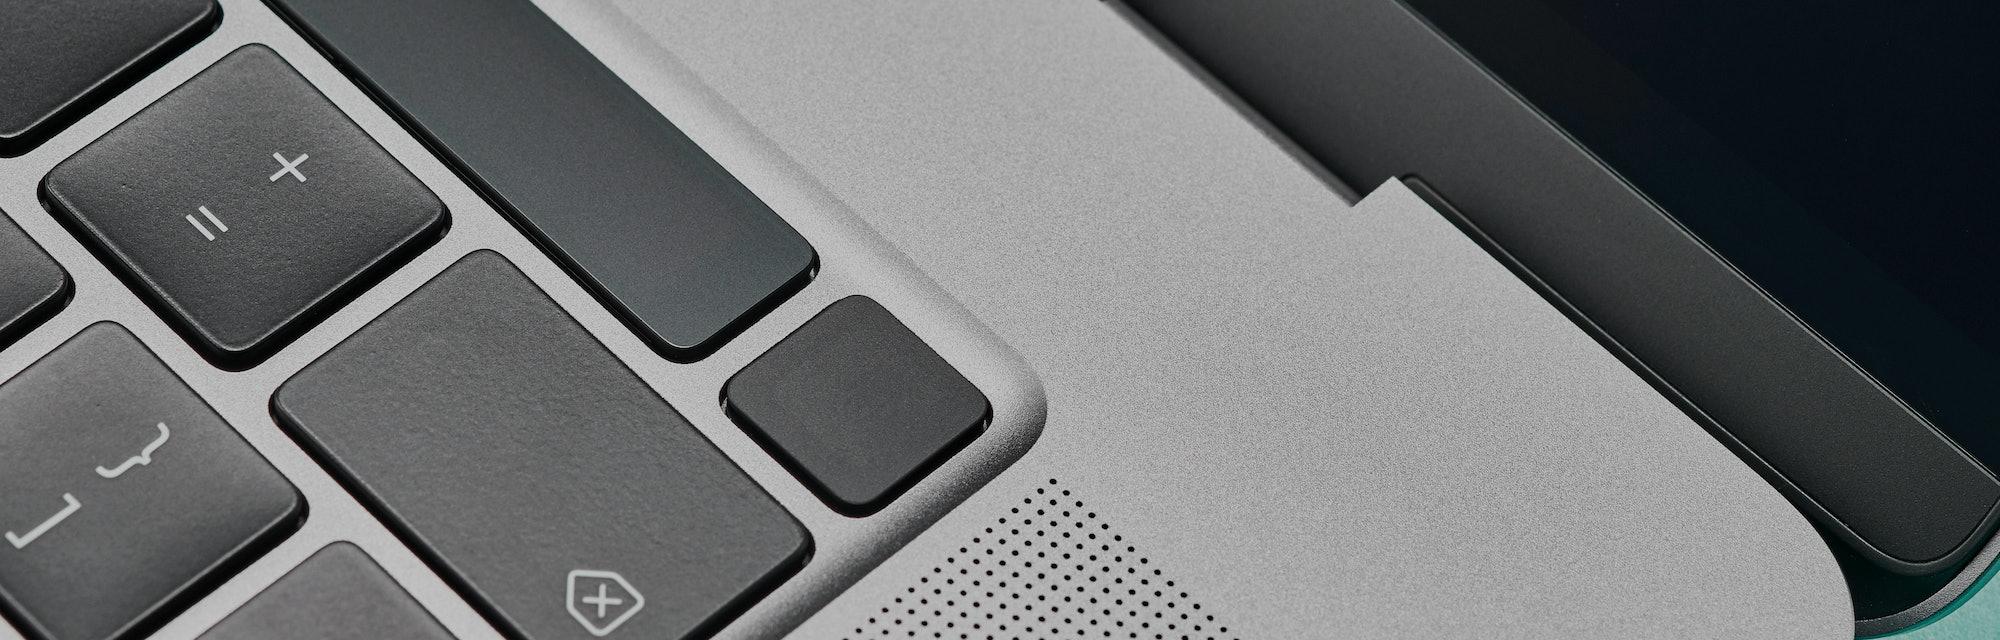 Detail of the fingerprint scanner on a 16-inch Apple MacBook Pro laptop computer, taken on October 2...